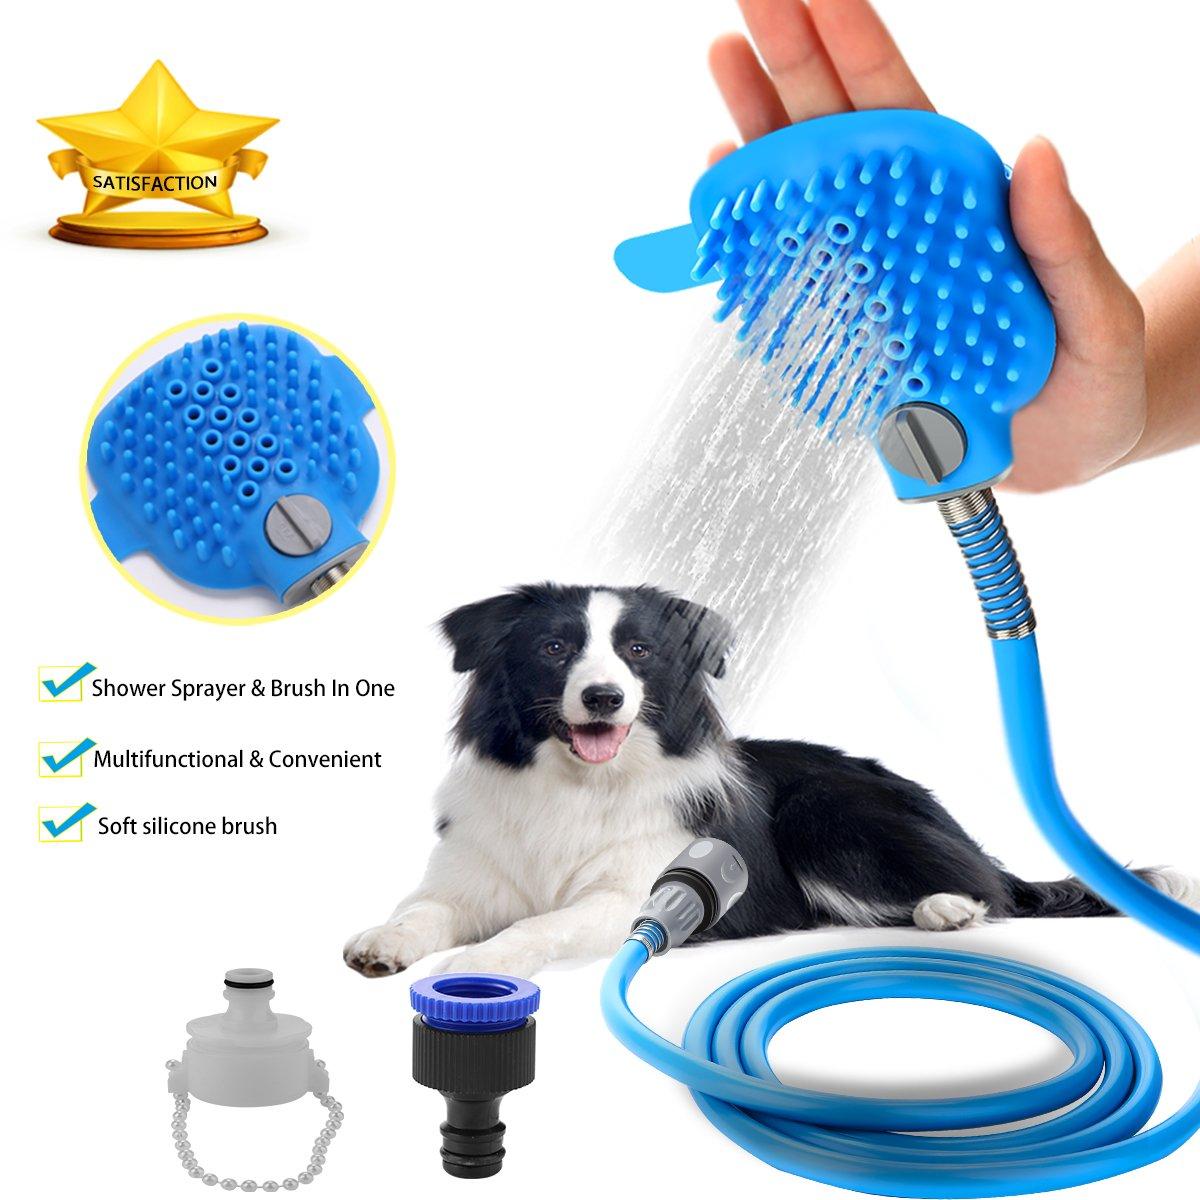 Pet Shower Sprayer Dog Bathing Tool - Shower Head & Brush in One 8.2 Ft Hose 2 Adapters, Dog Cat Horse Grooming & Massage, Dog Wash Bathtub Outdoor Use by Wonder (Image #1)